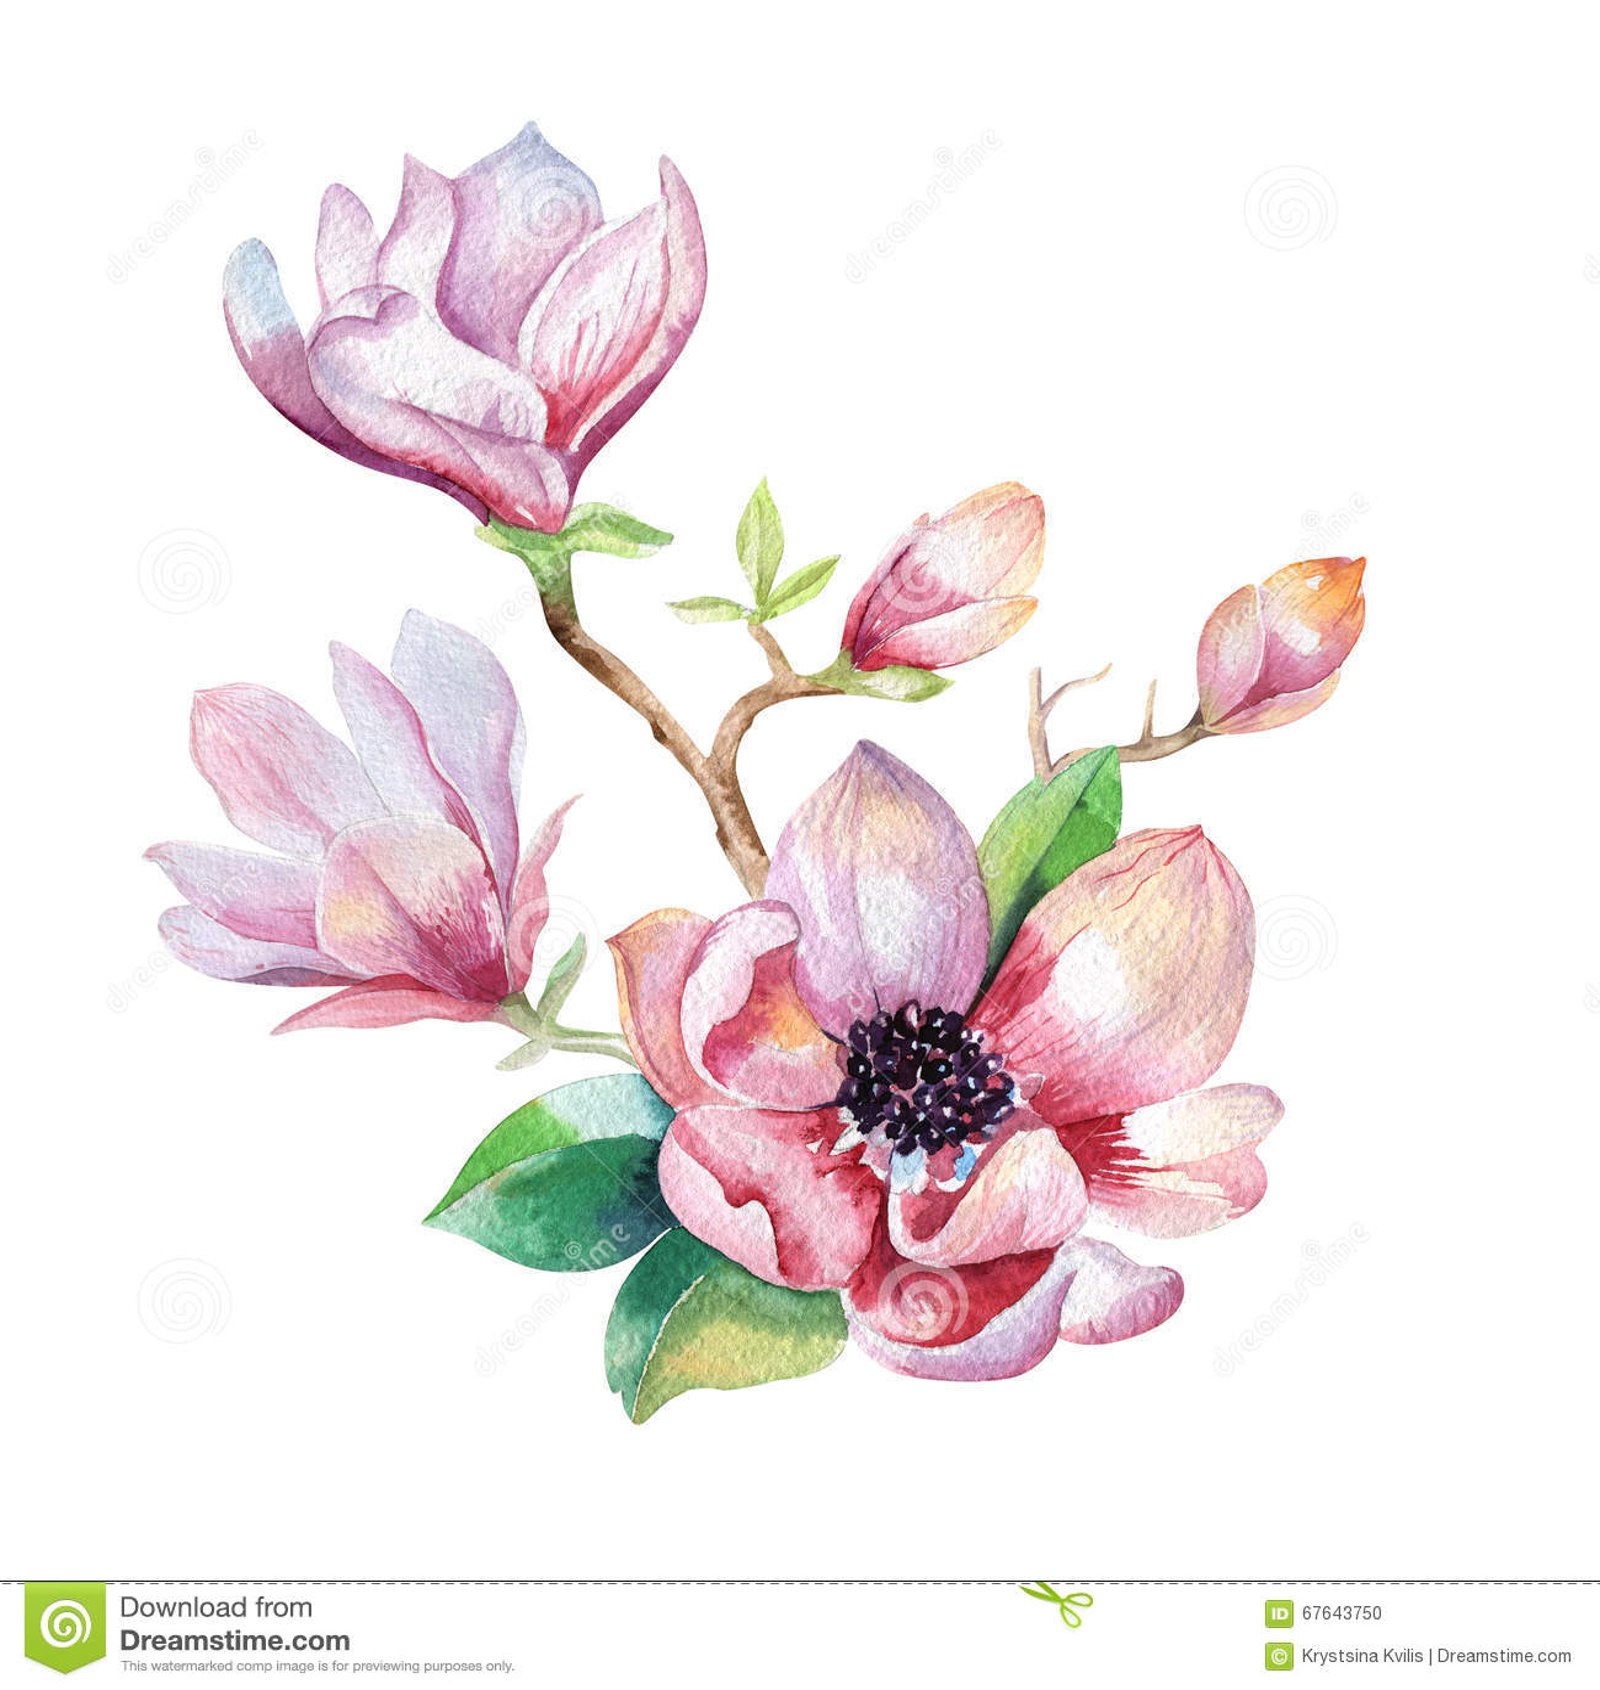 Painting Magnolia Flower Wallpaper. Hand Drawn Watercolor